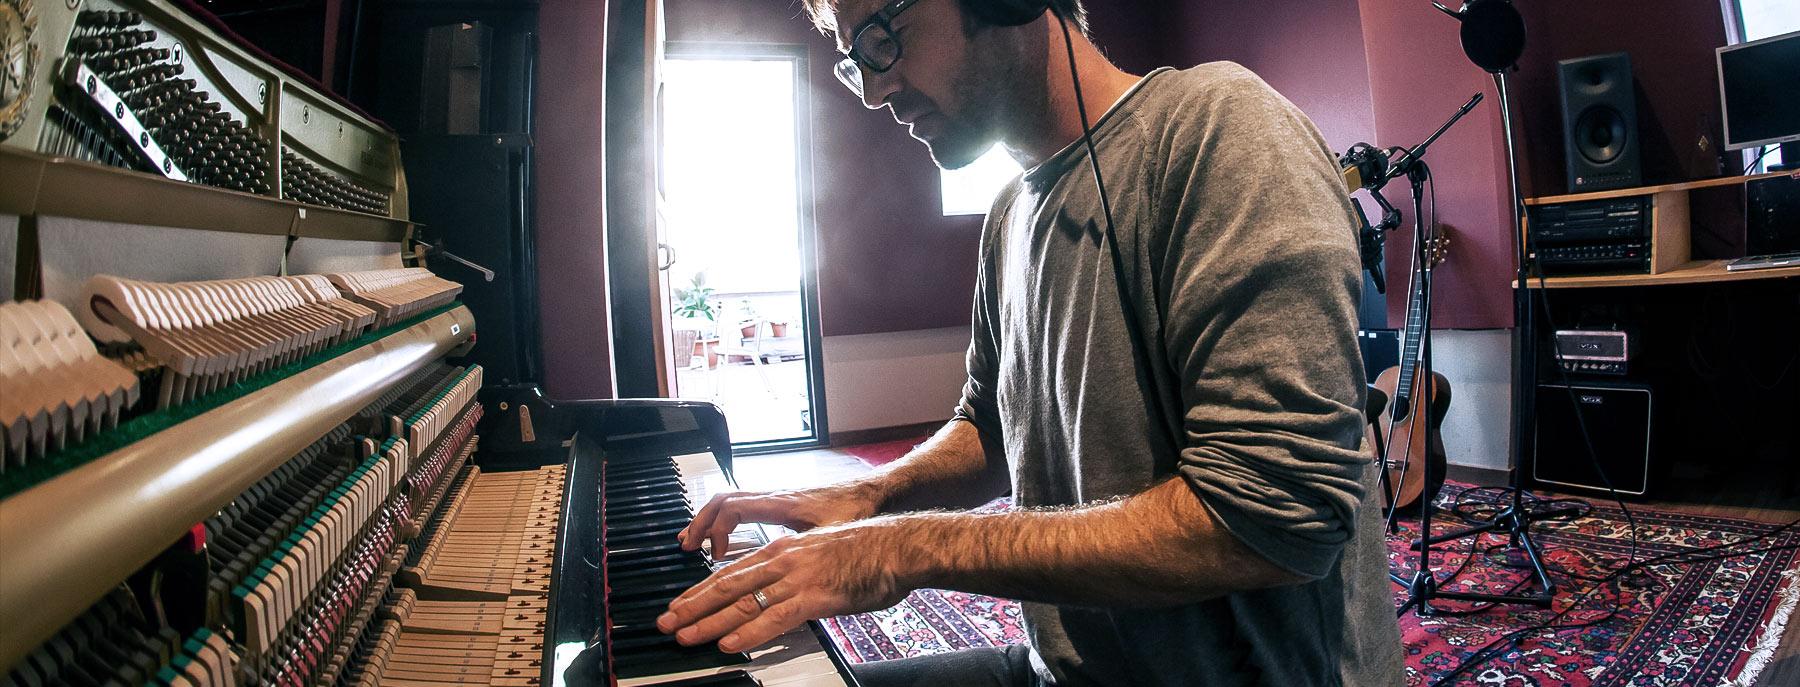 Simon Smith - Film Composer and musician, Barcelona